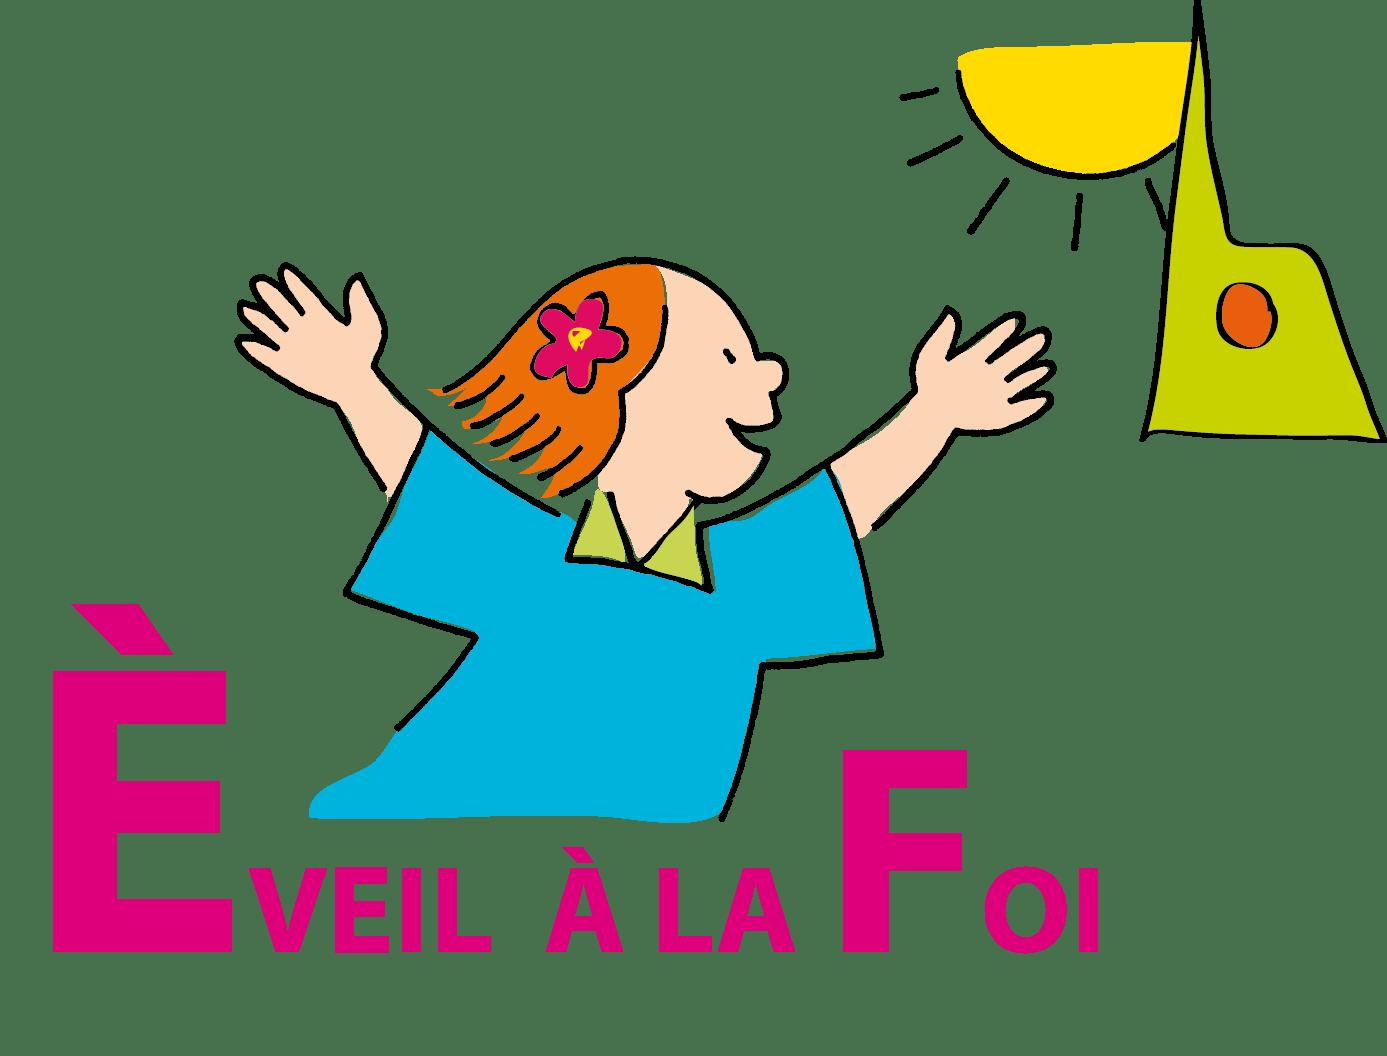 eveil_a_la_foi